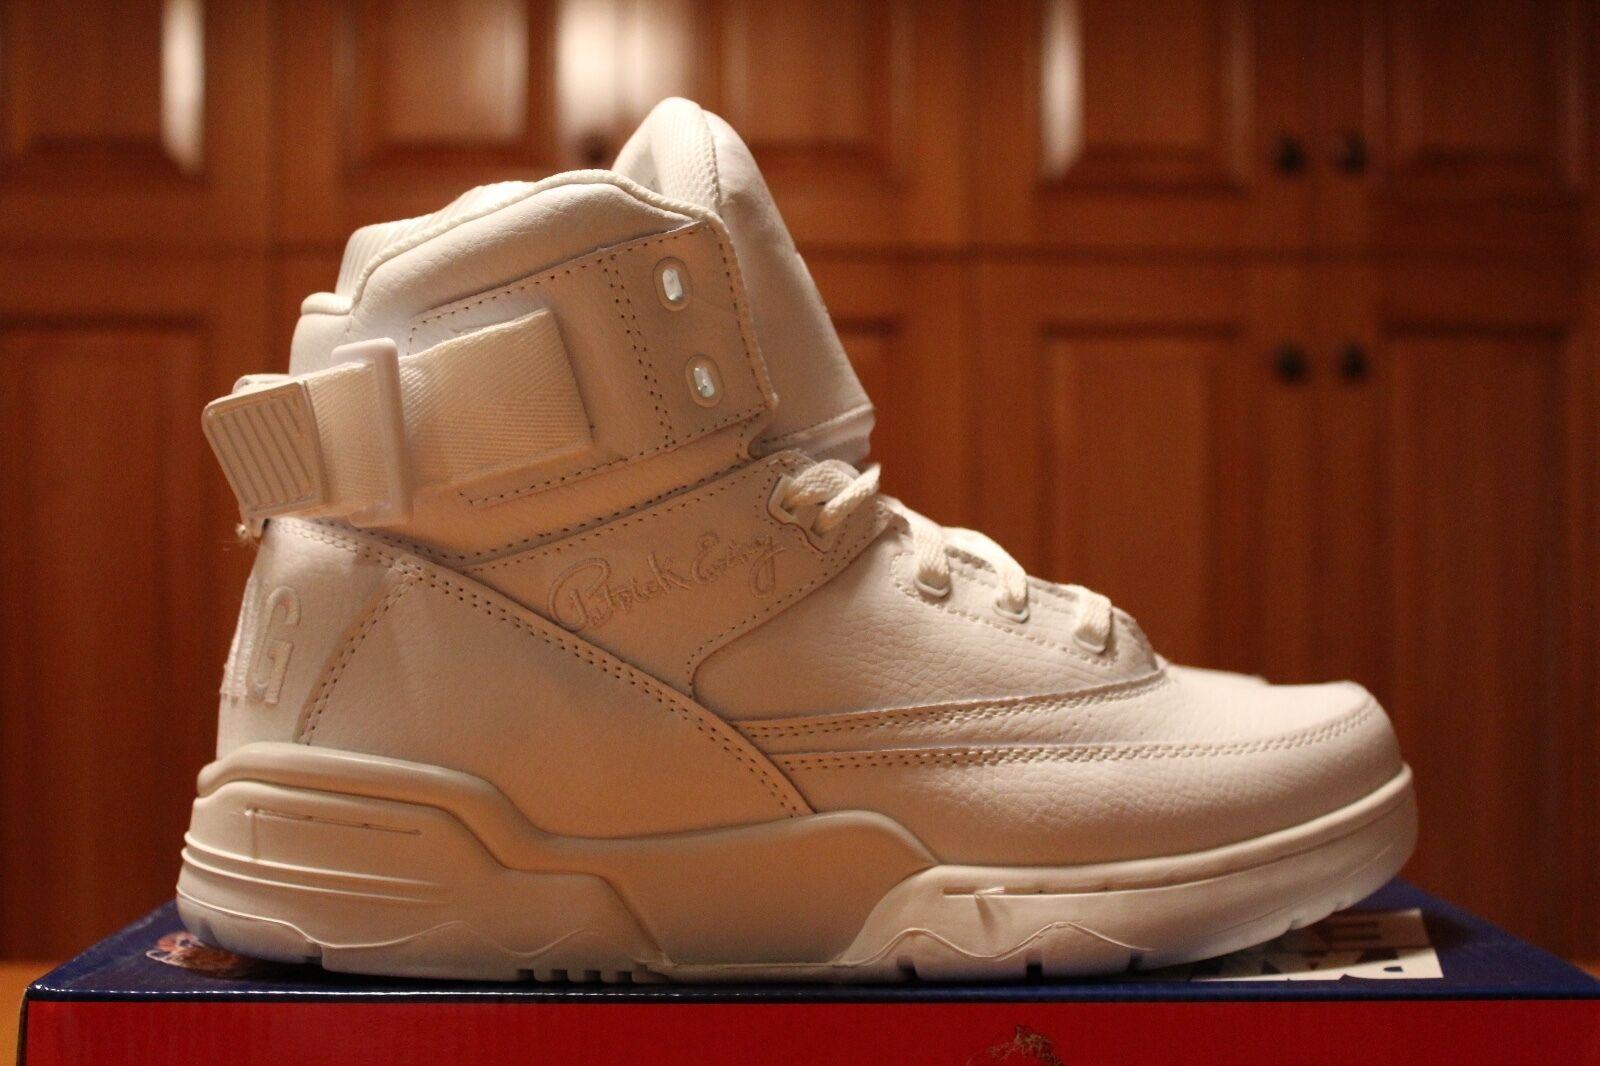 Ewing 33 hi White Basketball Shoes US Shoe Size 9.5